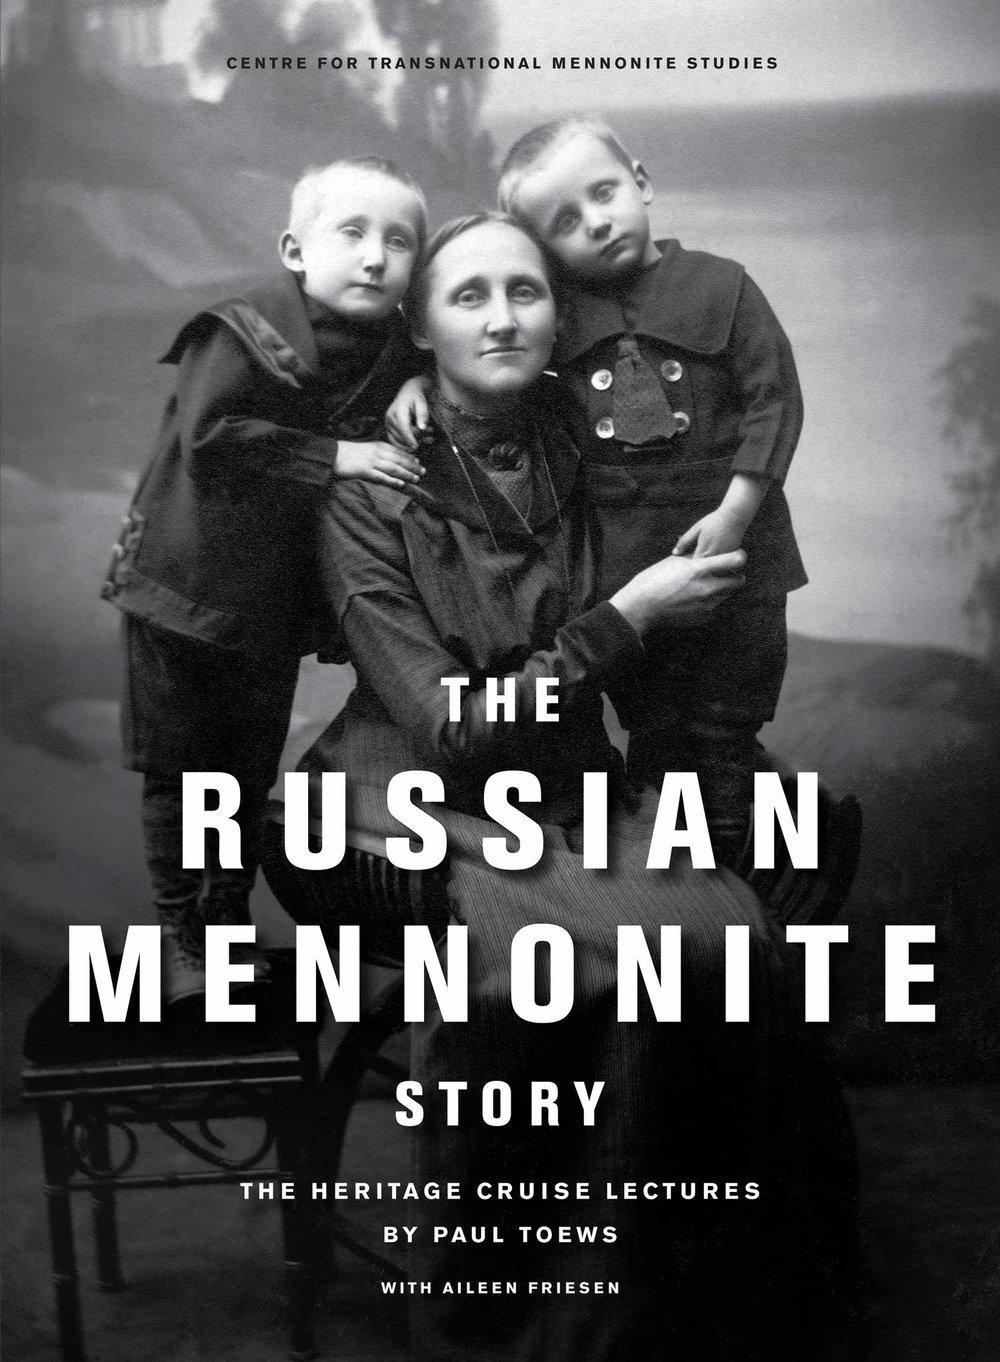 russian-mennonite-history-graphic-designer-aniko-szabo.jpg